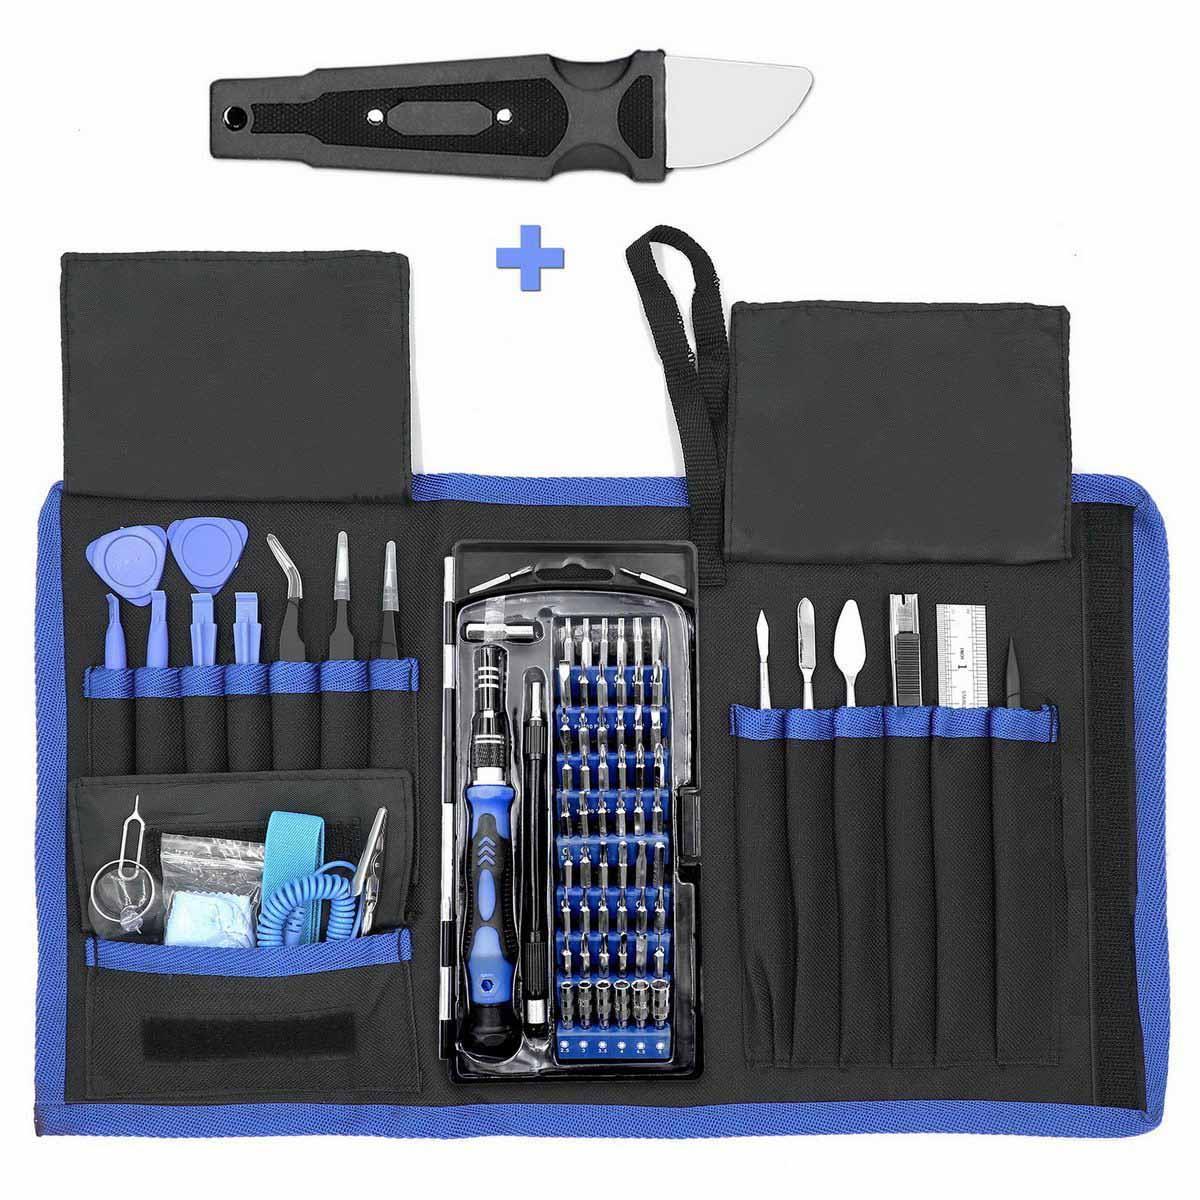 Multi-function screwdriver set 80-in-one manual combination kit mobile phone computer teardown repair daily household